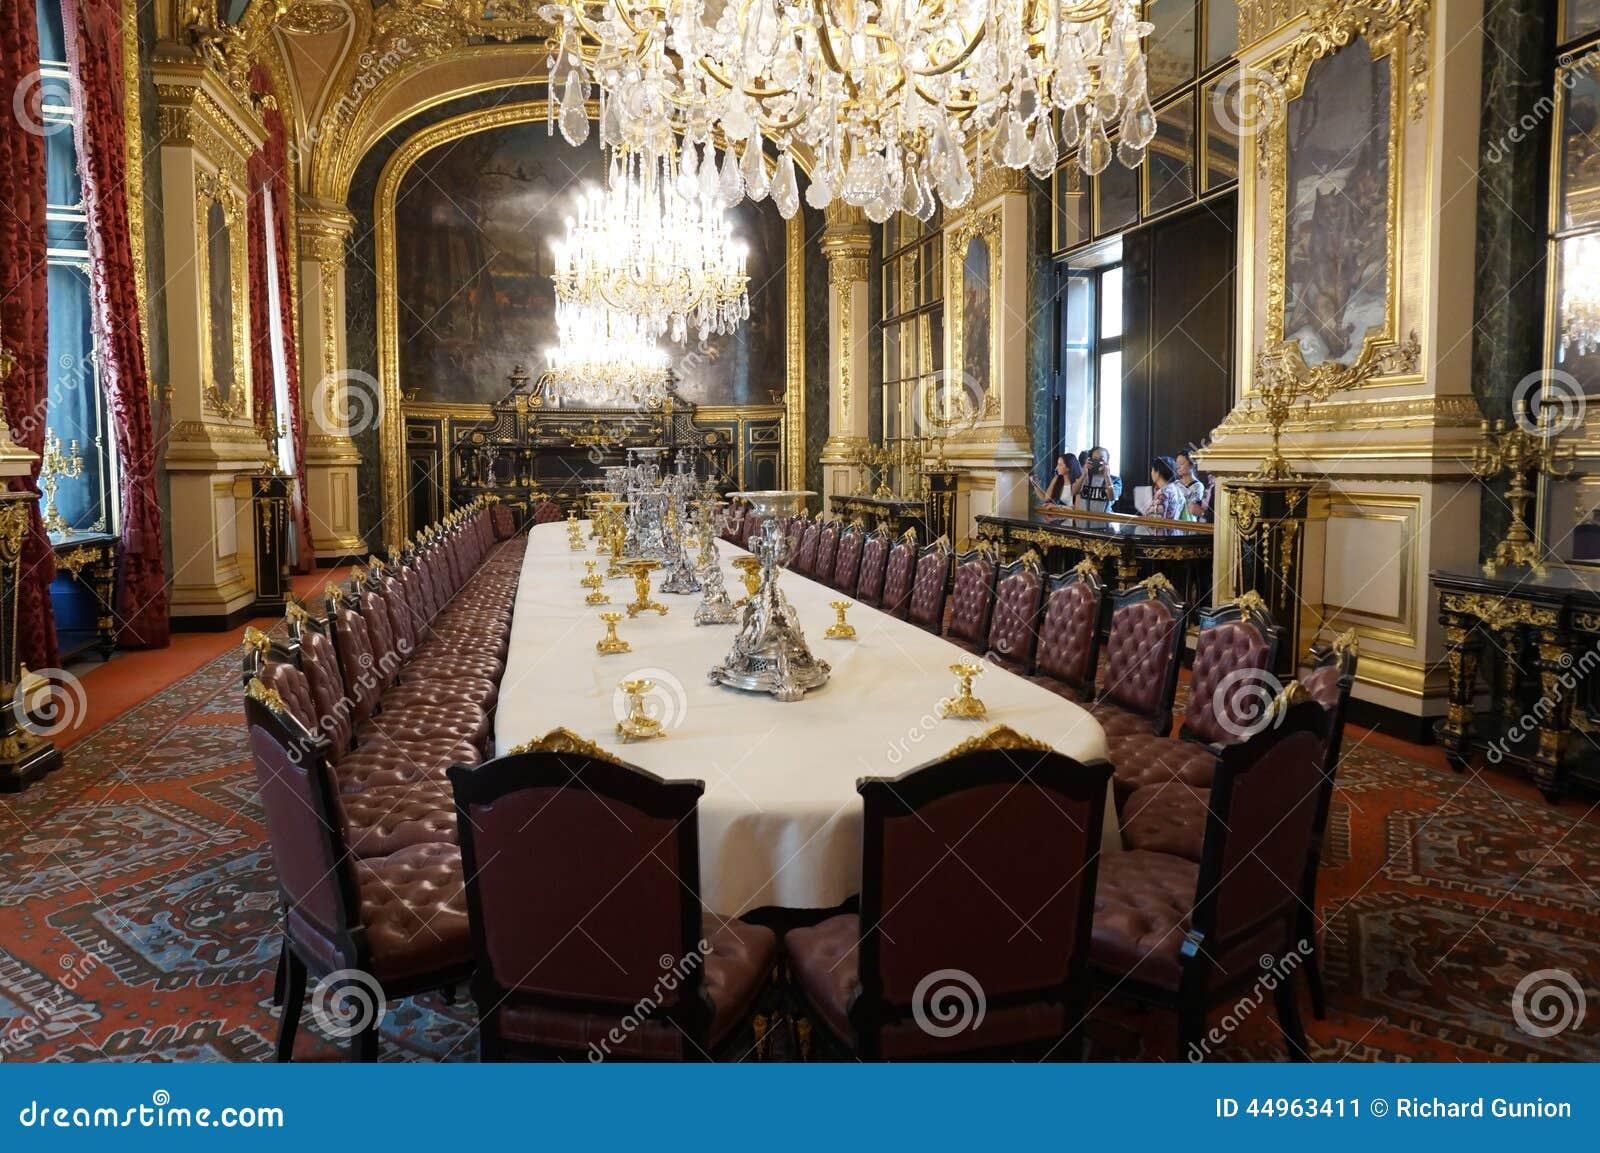 #927339 Salle A Manger Moderne Occasion Belgique ~ Solutions Pour  3803 salle a manger moderne occasion liege 1300x954 px @ aertt.com